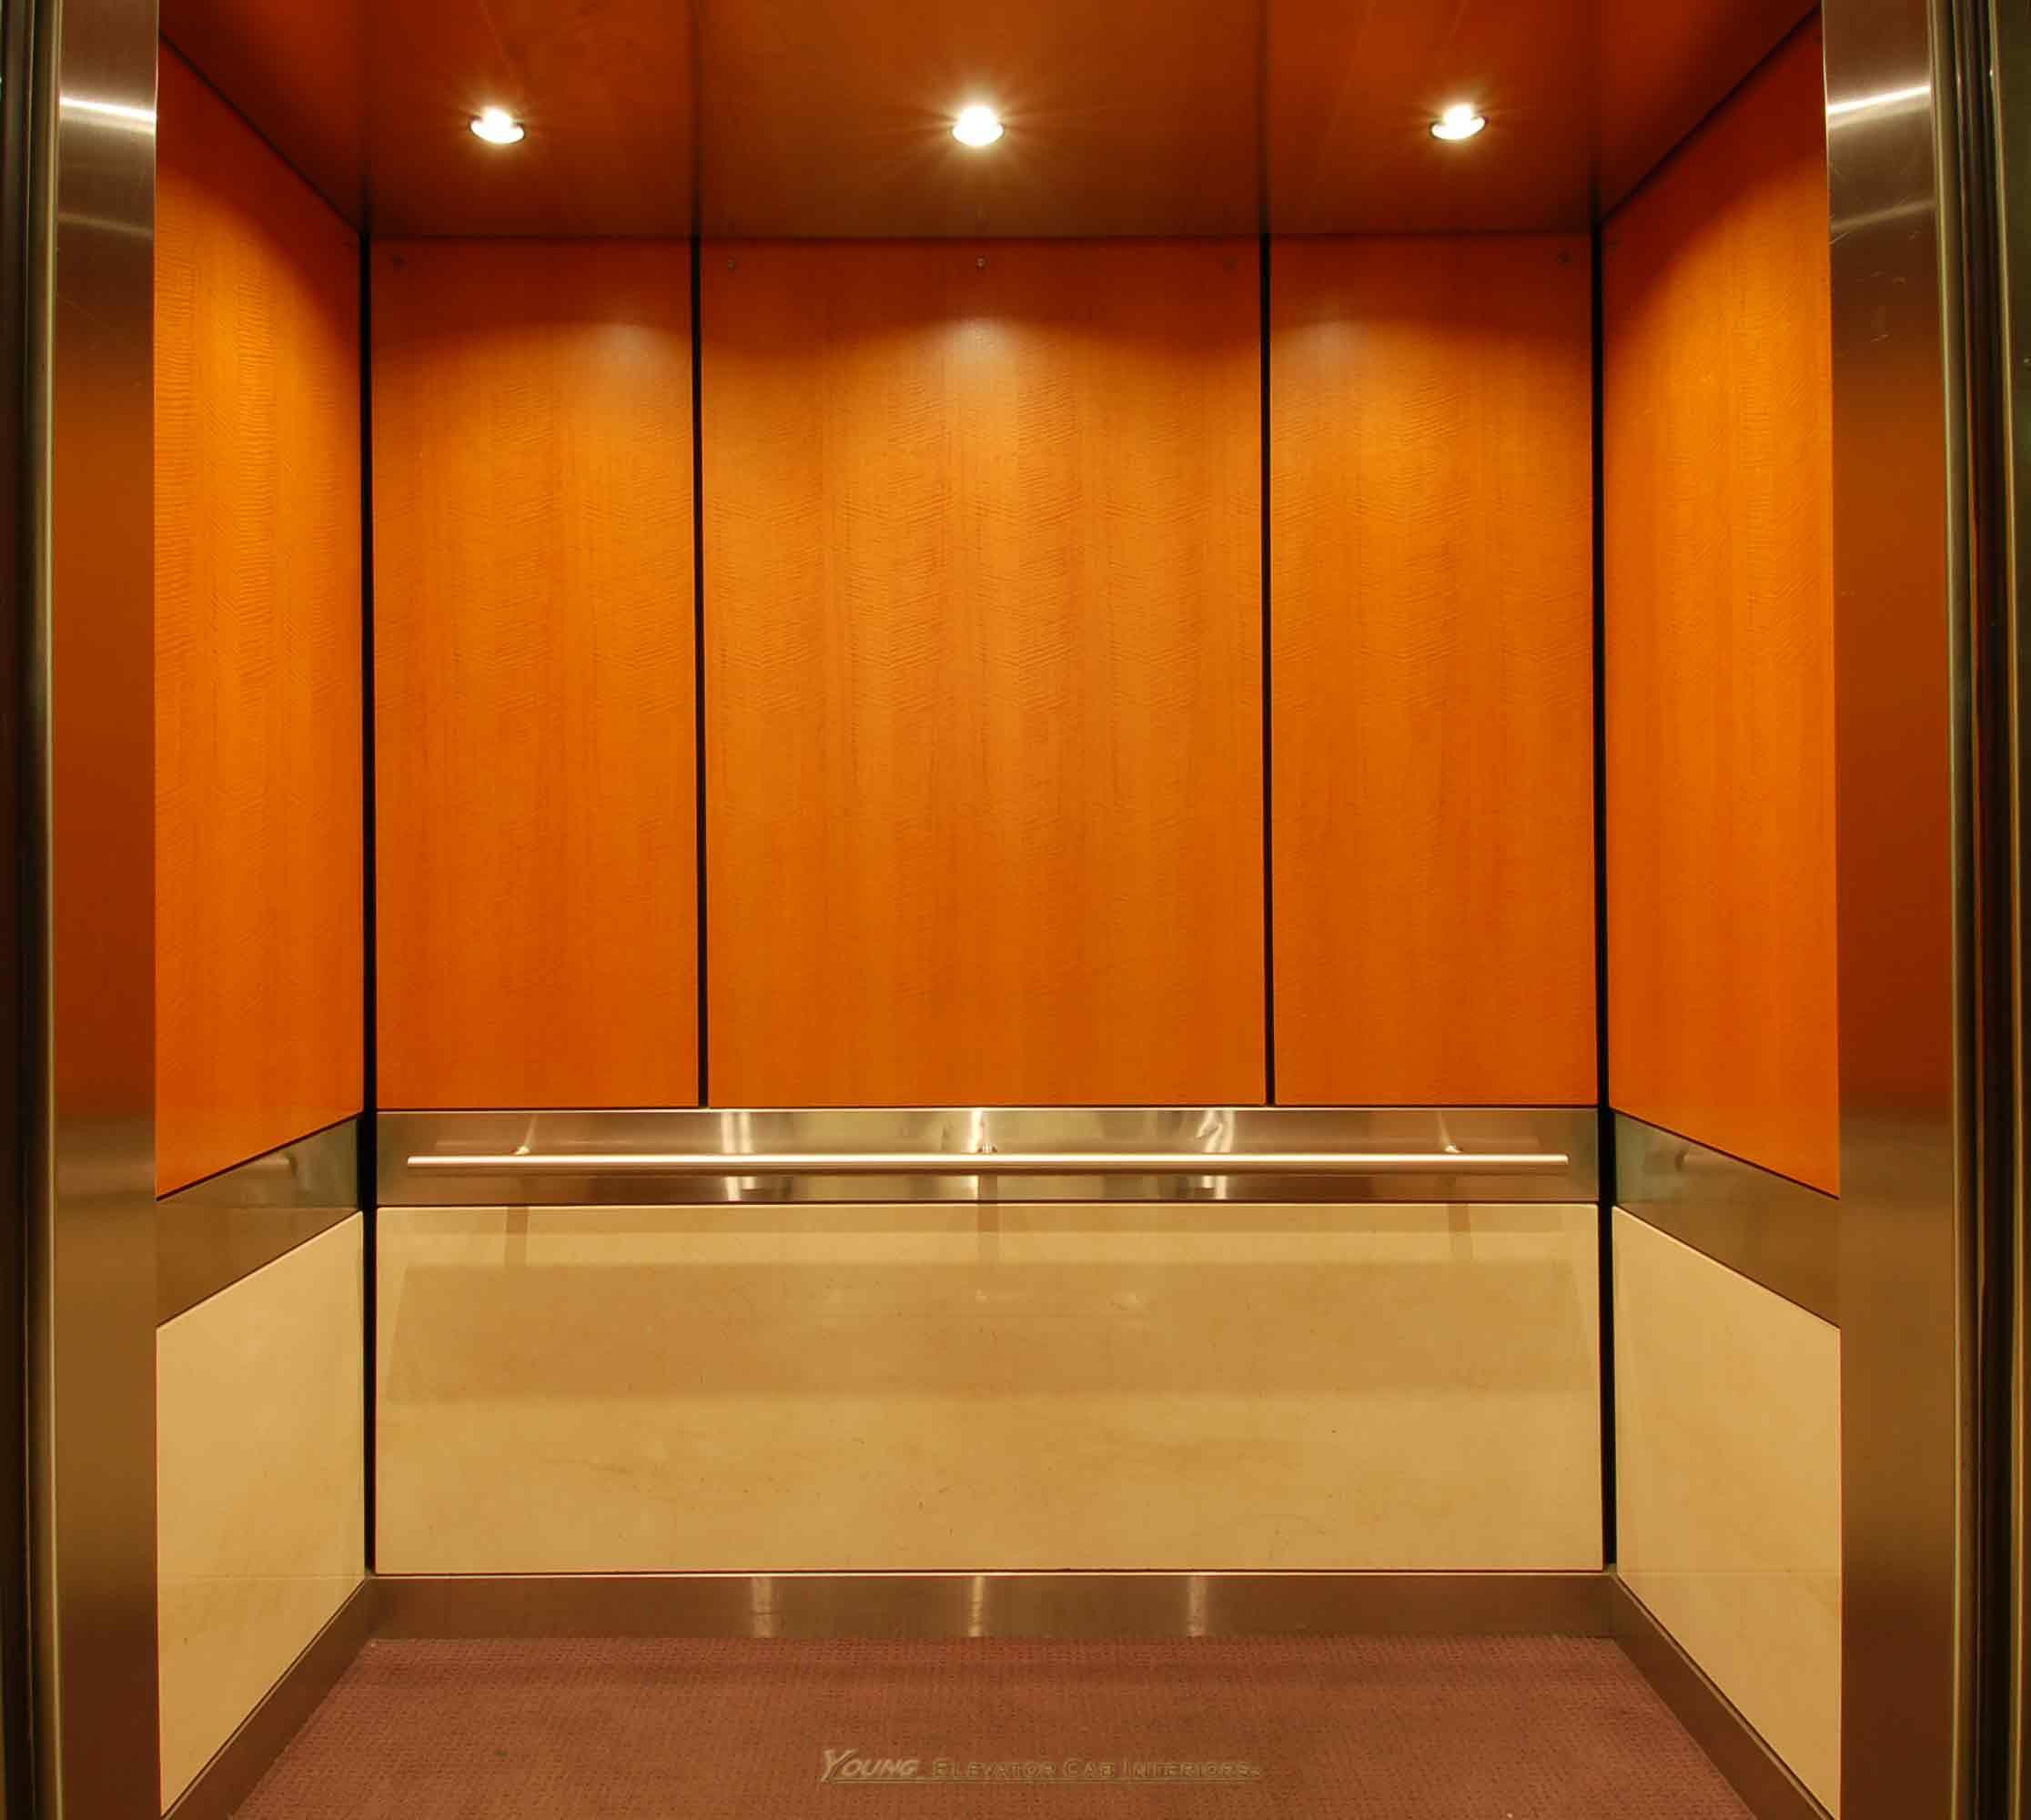 Insanity-Inducing Elevator